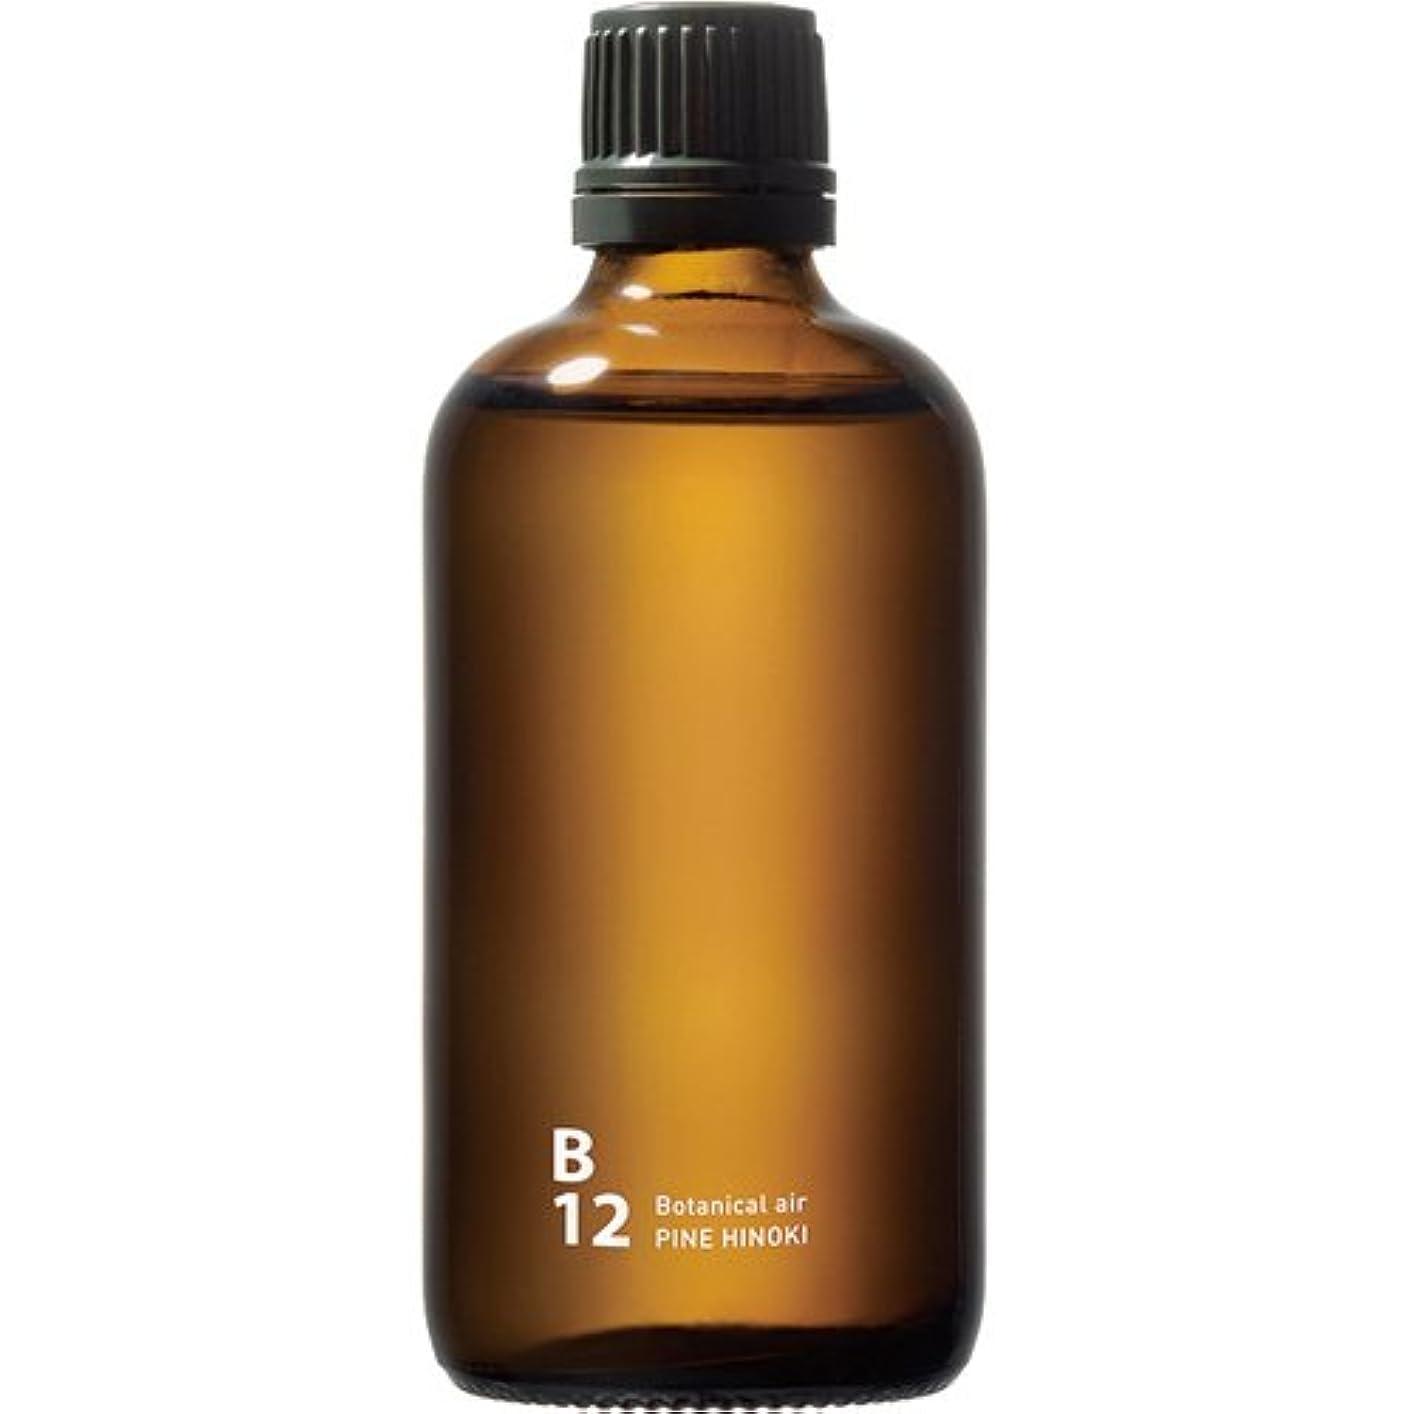 泥沼ラボ外交B12 PINE HINOKI piezo aroma oil 100ml